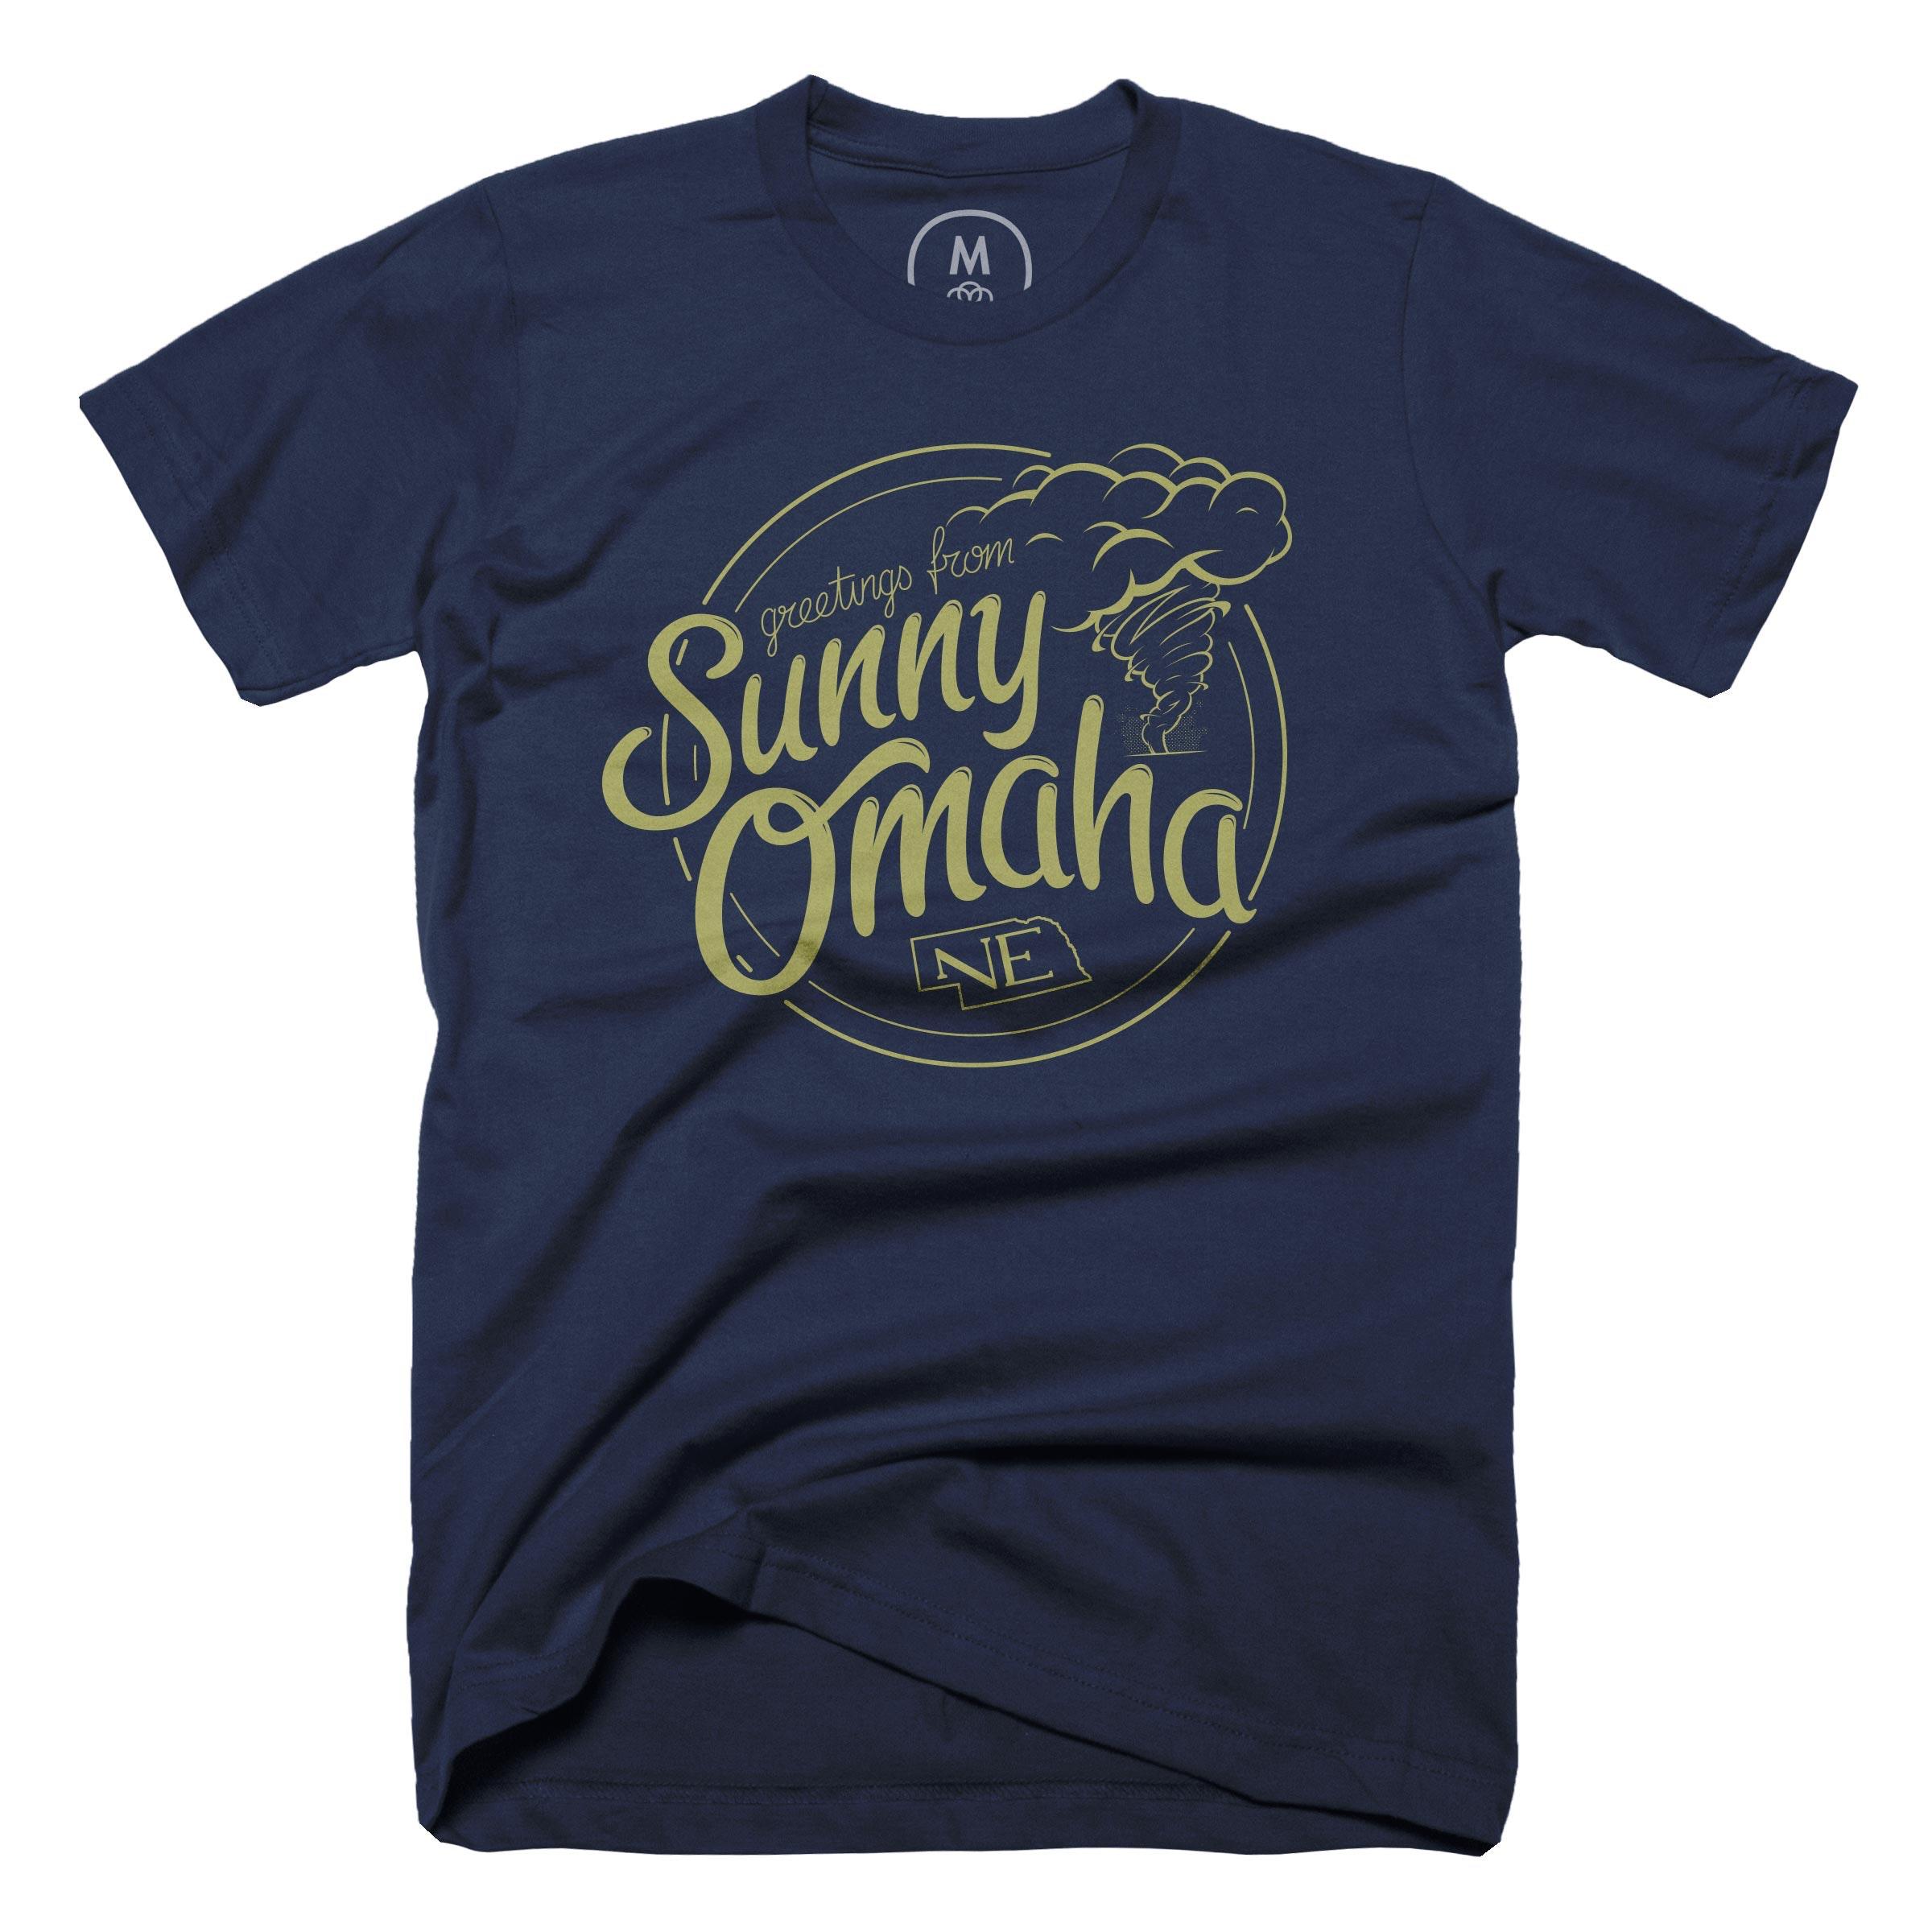 Greetings from Sunny Omaha